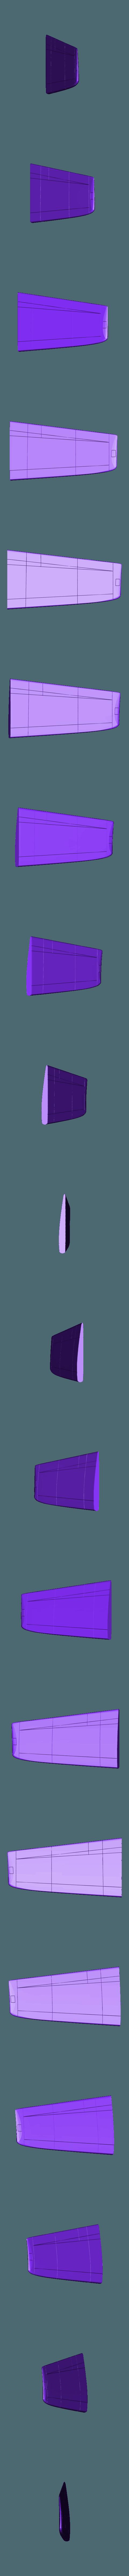 alaizquierda.stl Download STL file IA-63 Pampa • 3D print object, Nico_3D